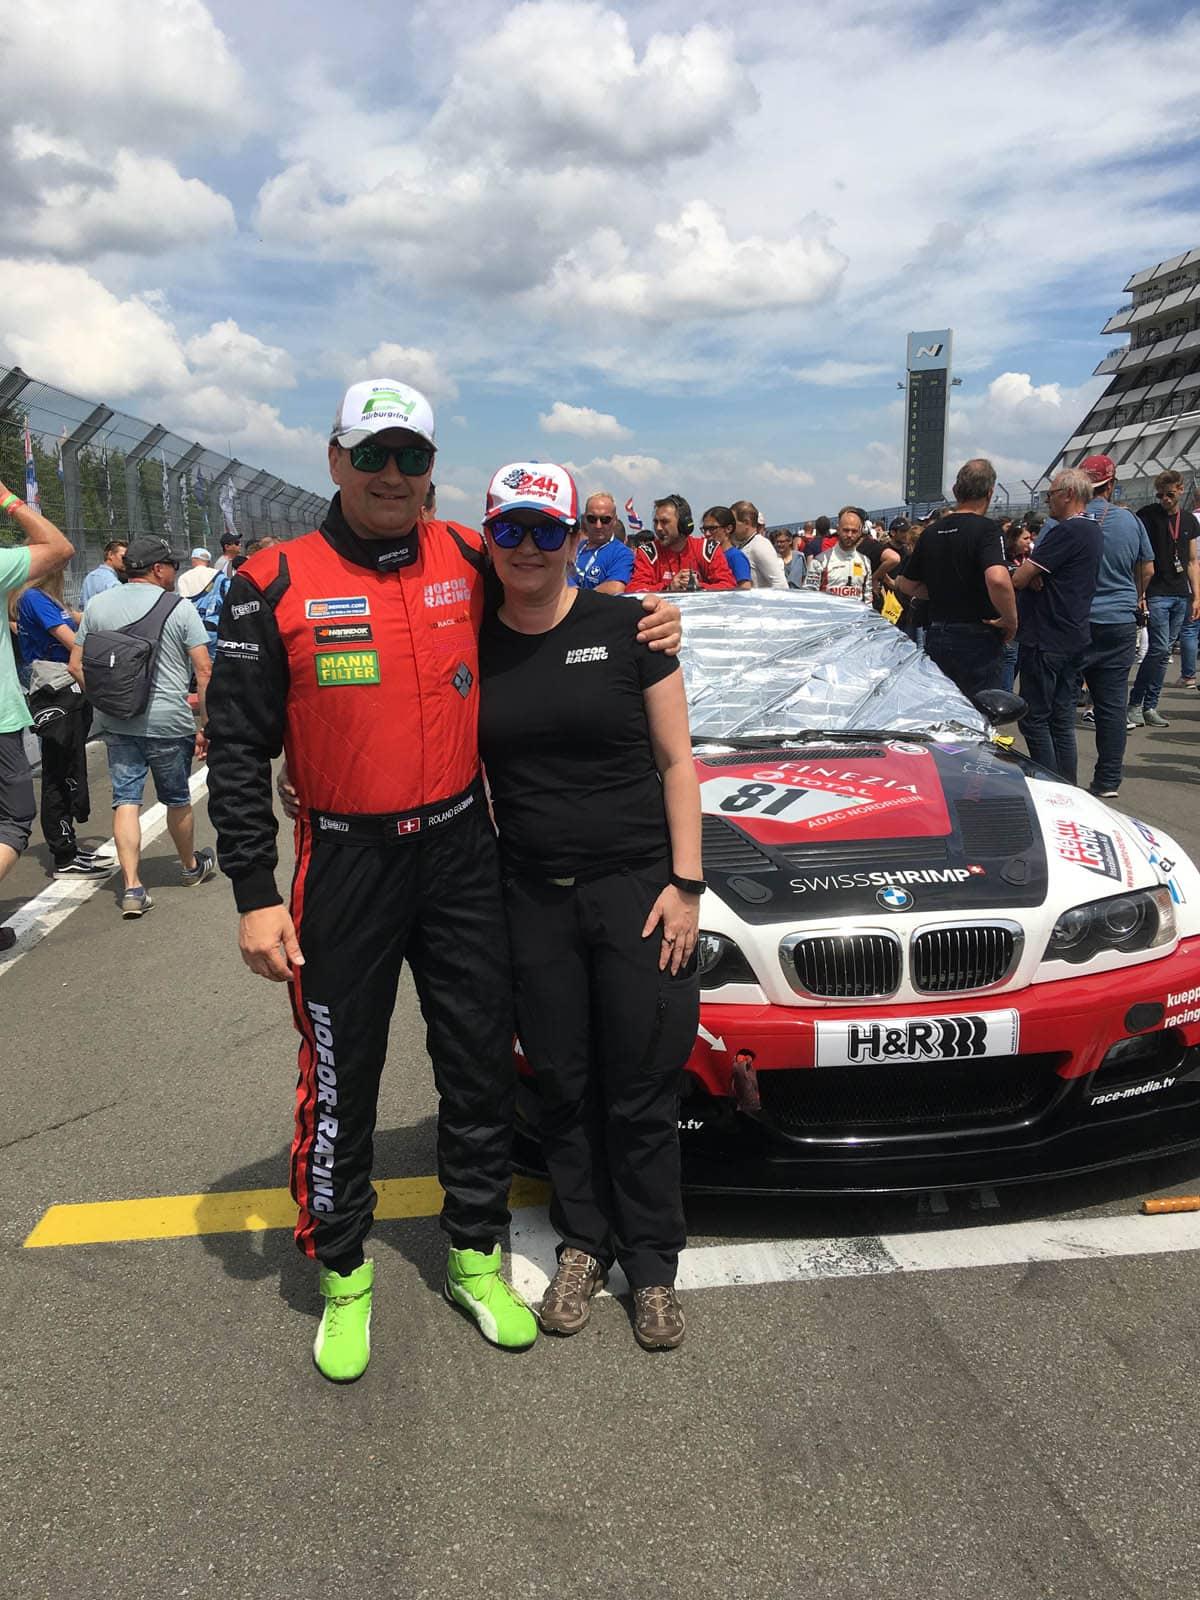 IMG 2034 - 21.-23. Juni 2019 – ADAC TOTAL 24h Rennen – Nürburgring / DE